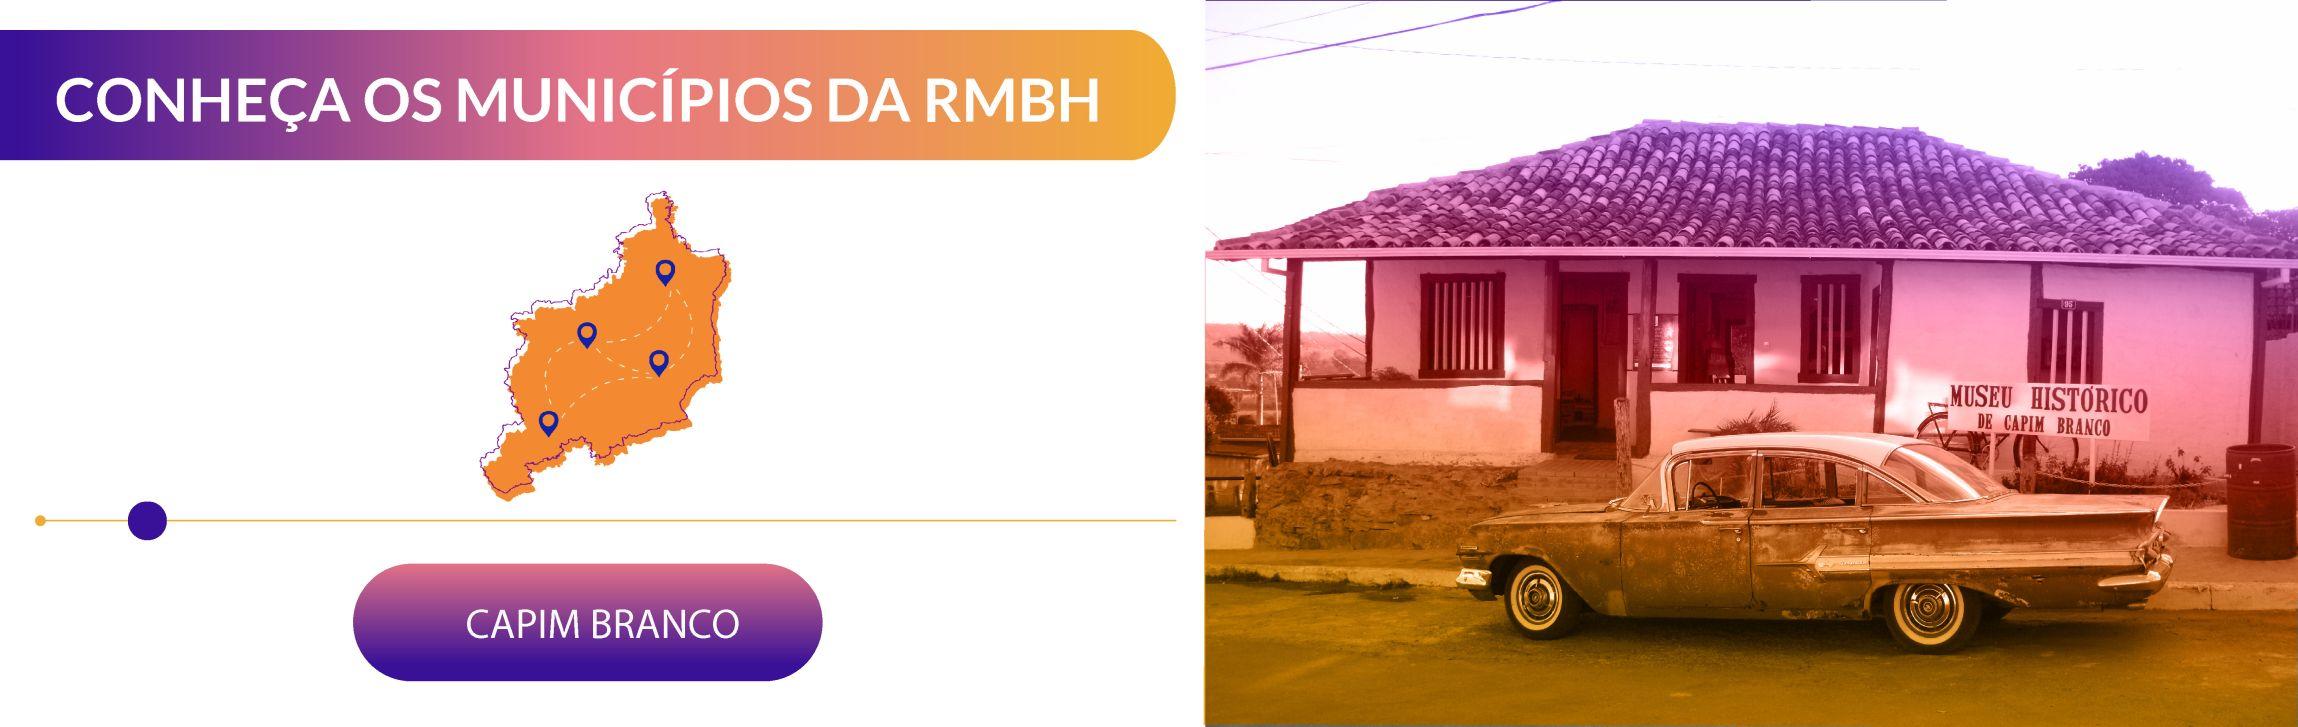 banner-municipio-capimbranco-01